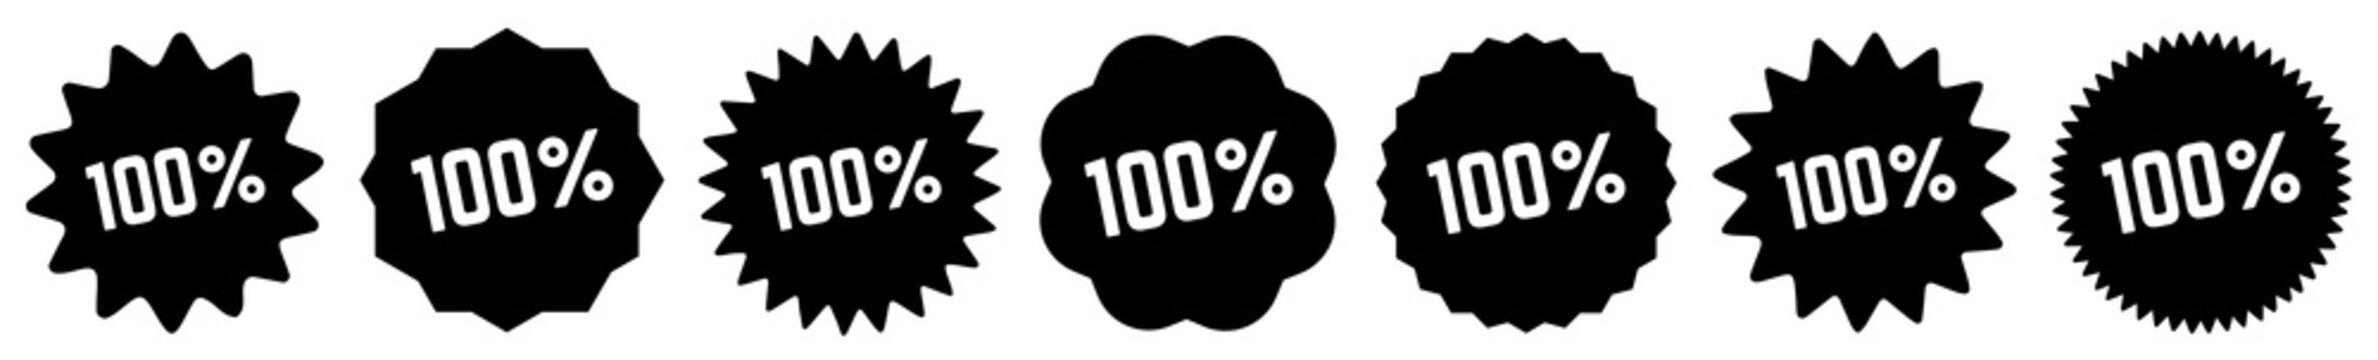 100 % Tag Black | 100 Percent Icon | Sticker | Label | Variations